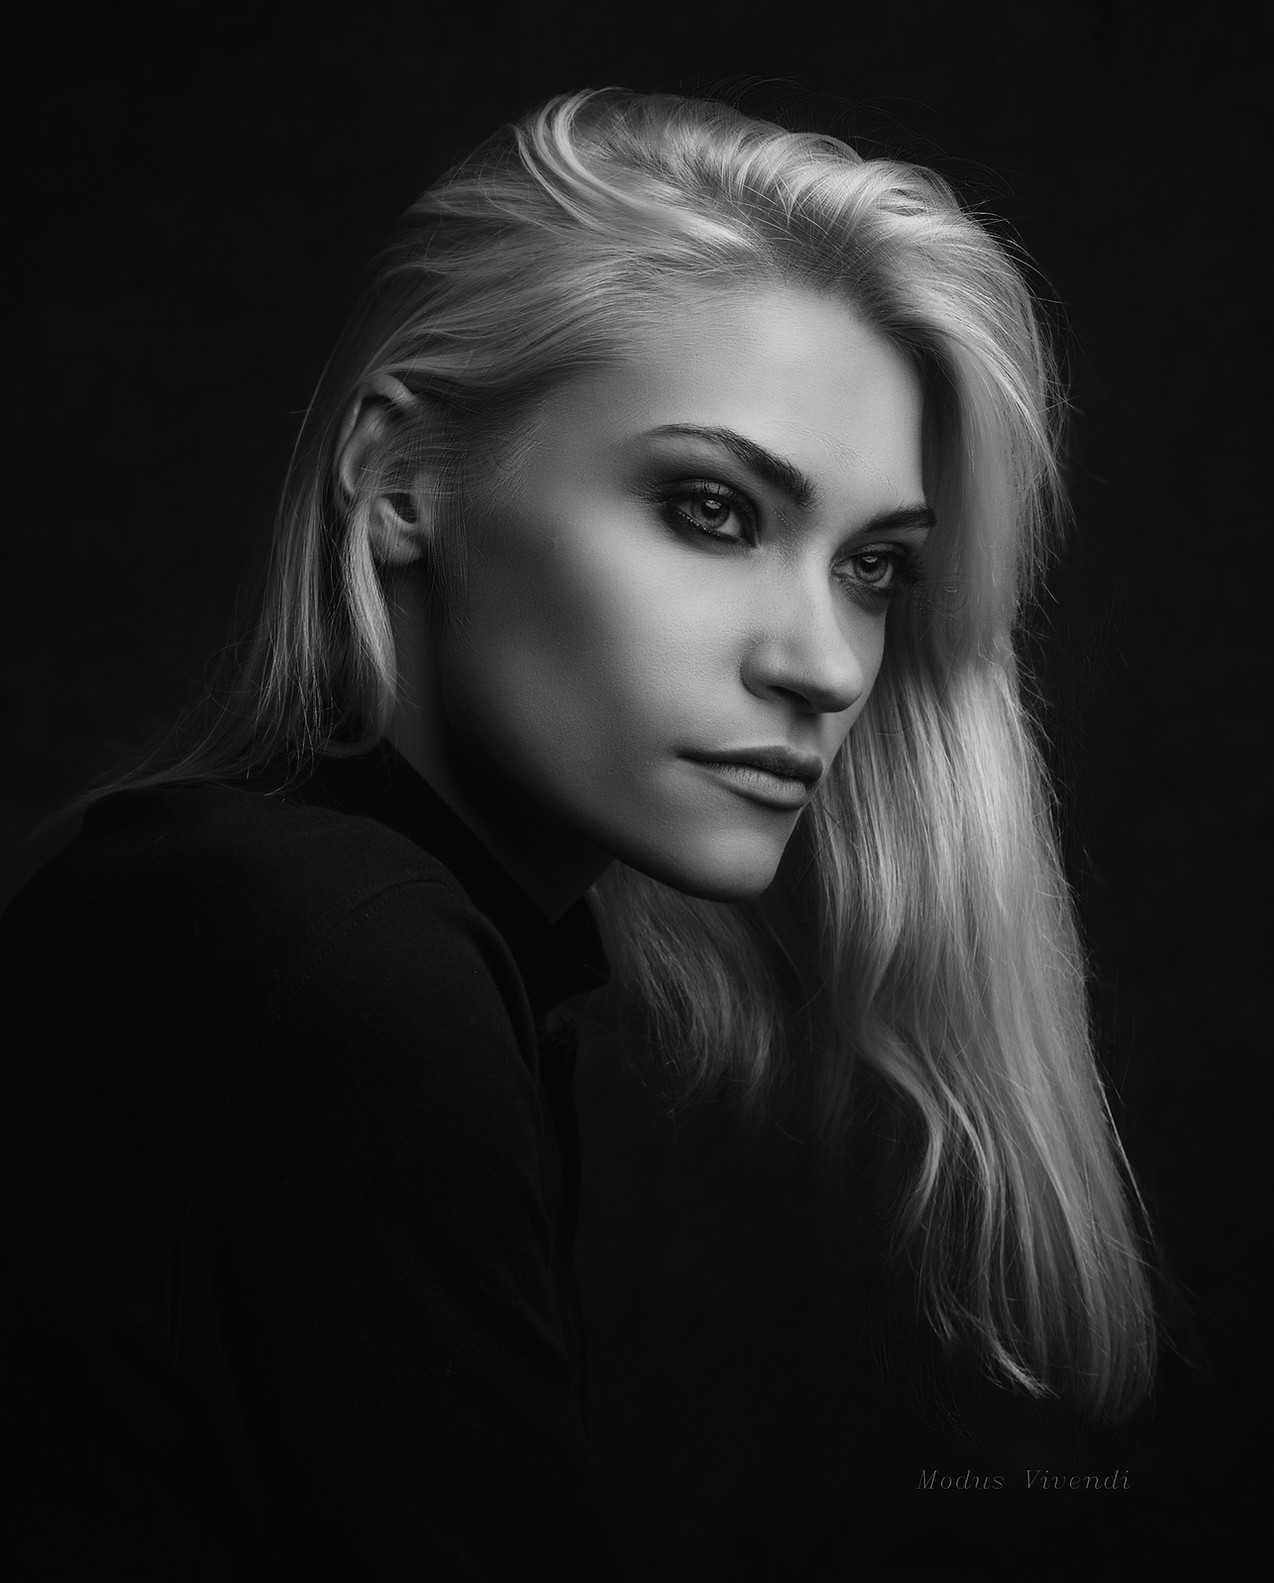 Marija Zi  (1 of 1)-2.JPG